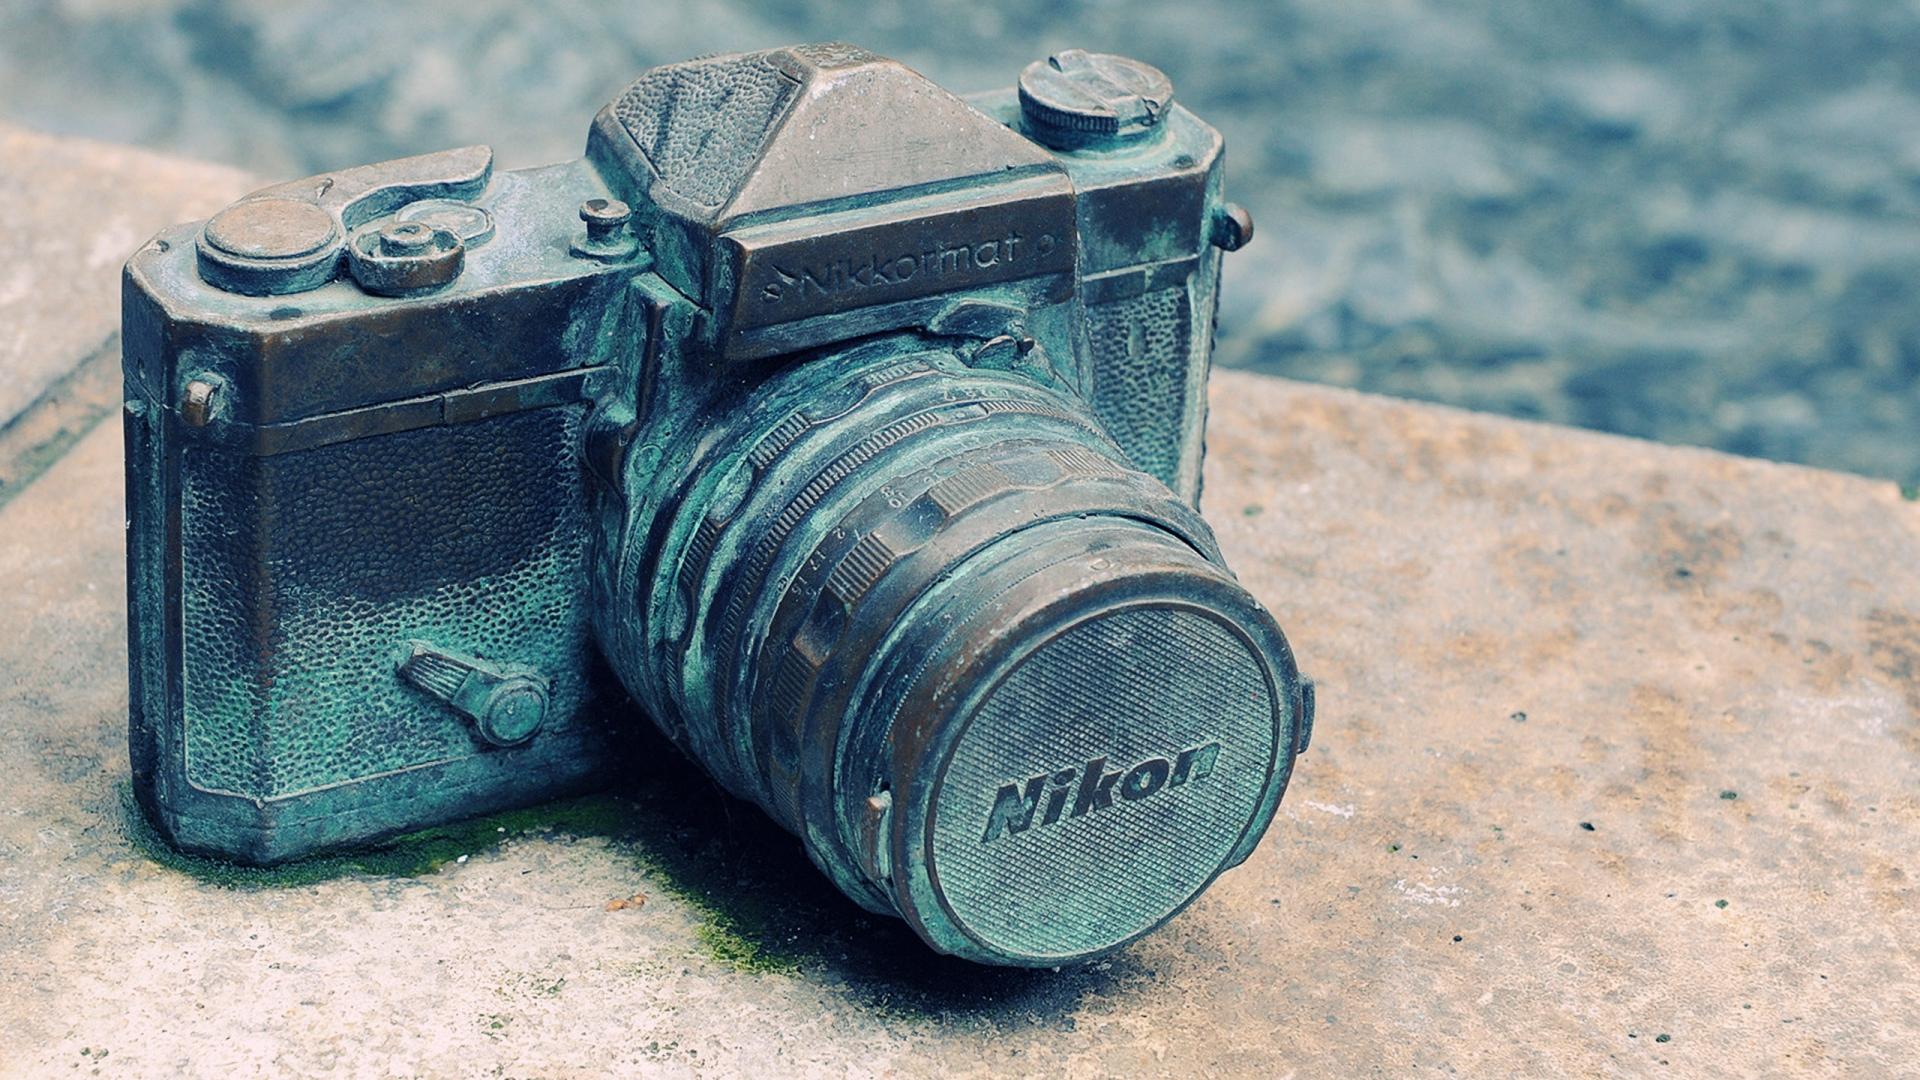 Camera Vintage Android : 240x320 nikon camera vintage nokia 230 nokia 215 samsung xcover